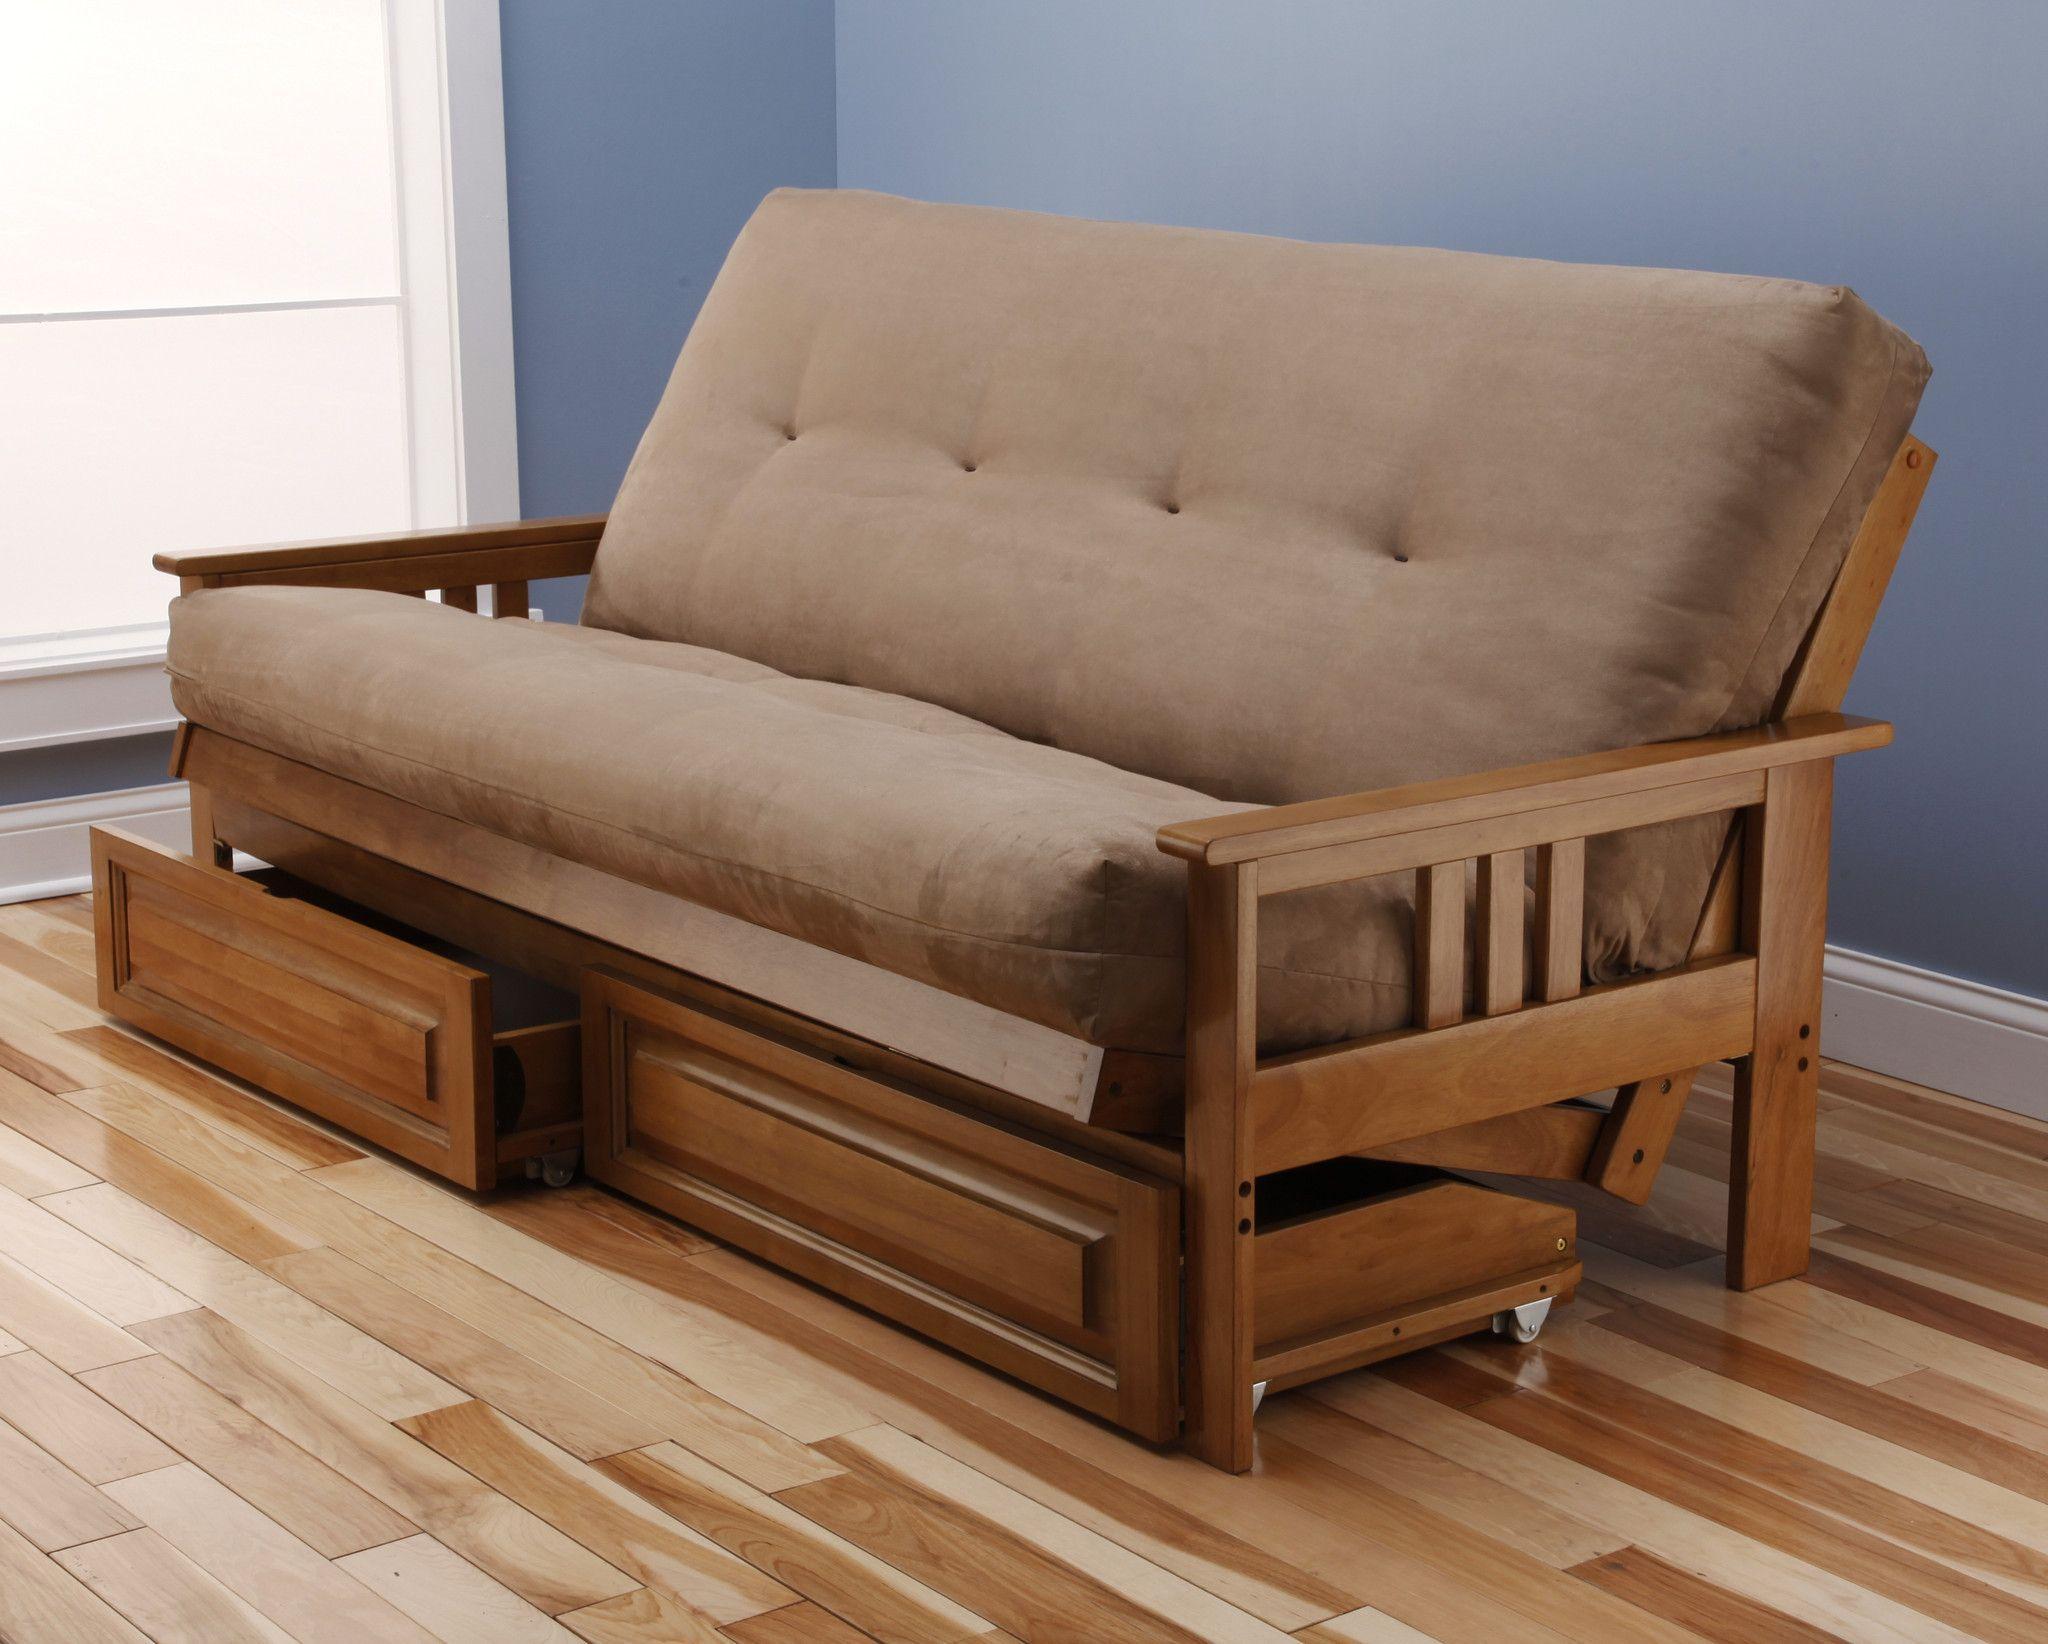 andover futon frame and drawer set in light honey oak wood suede